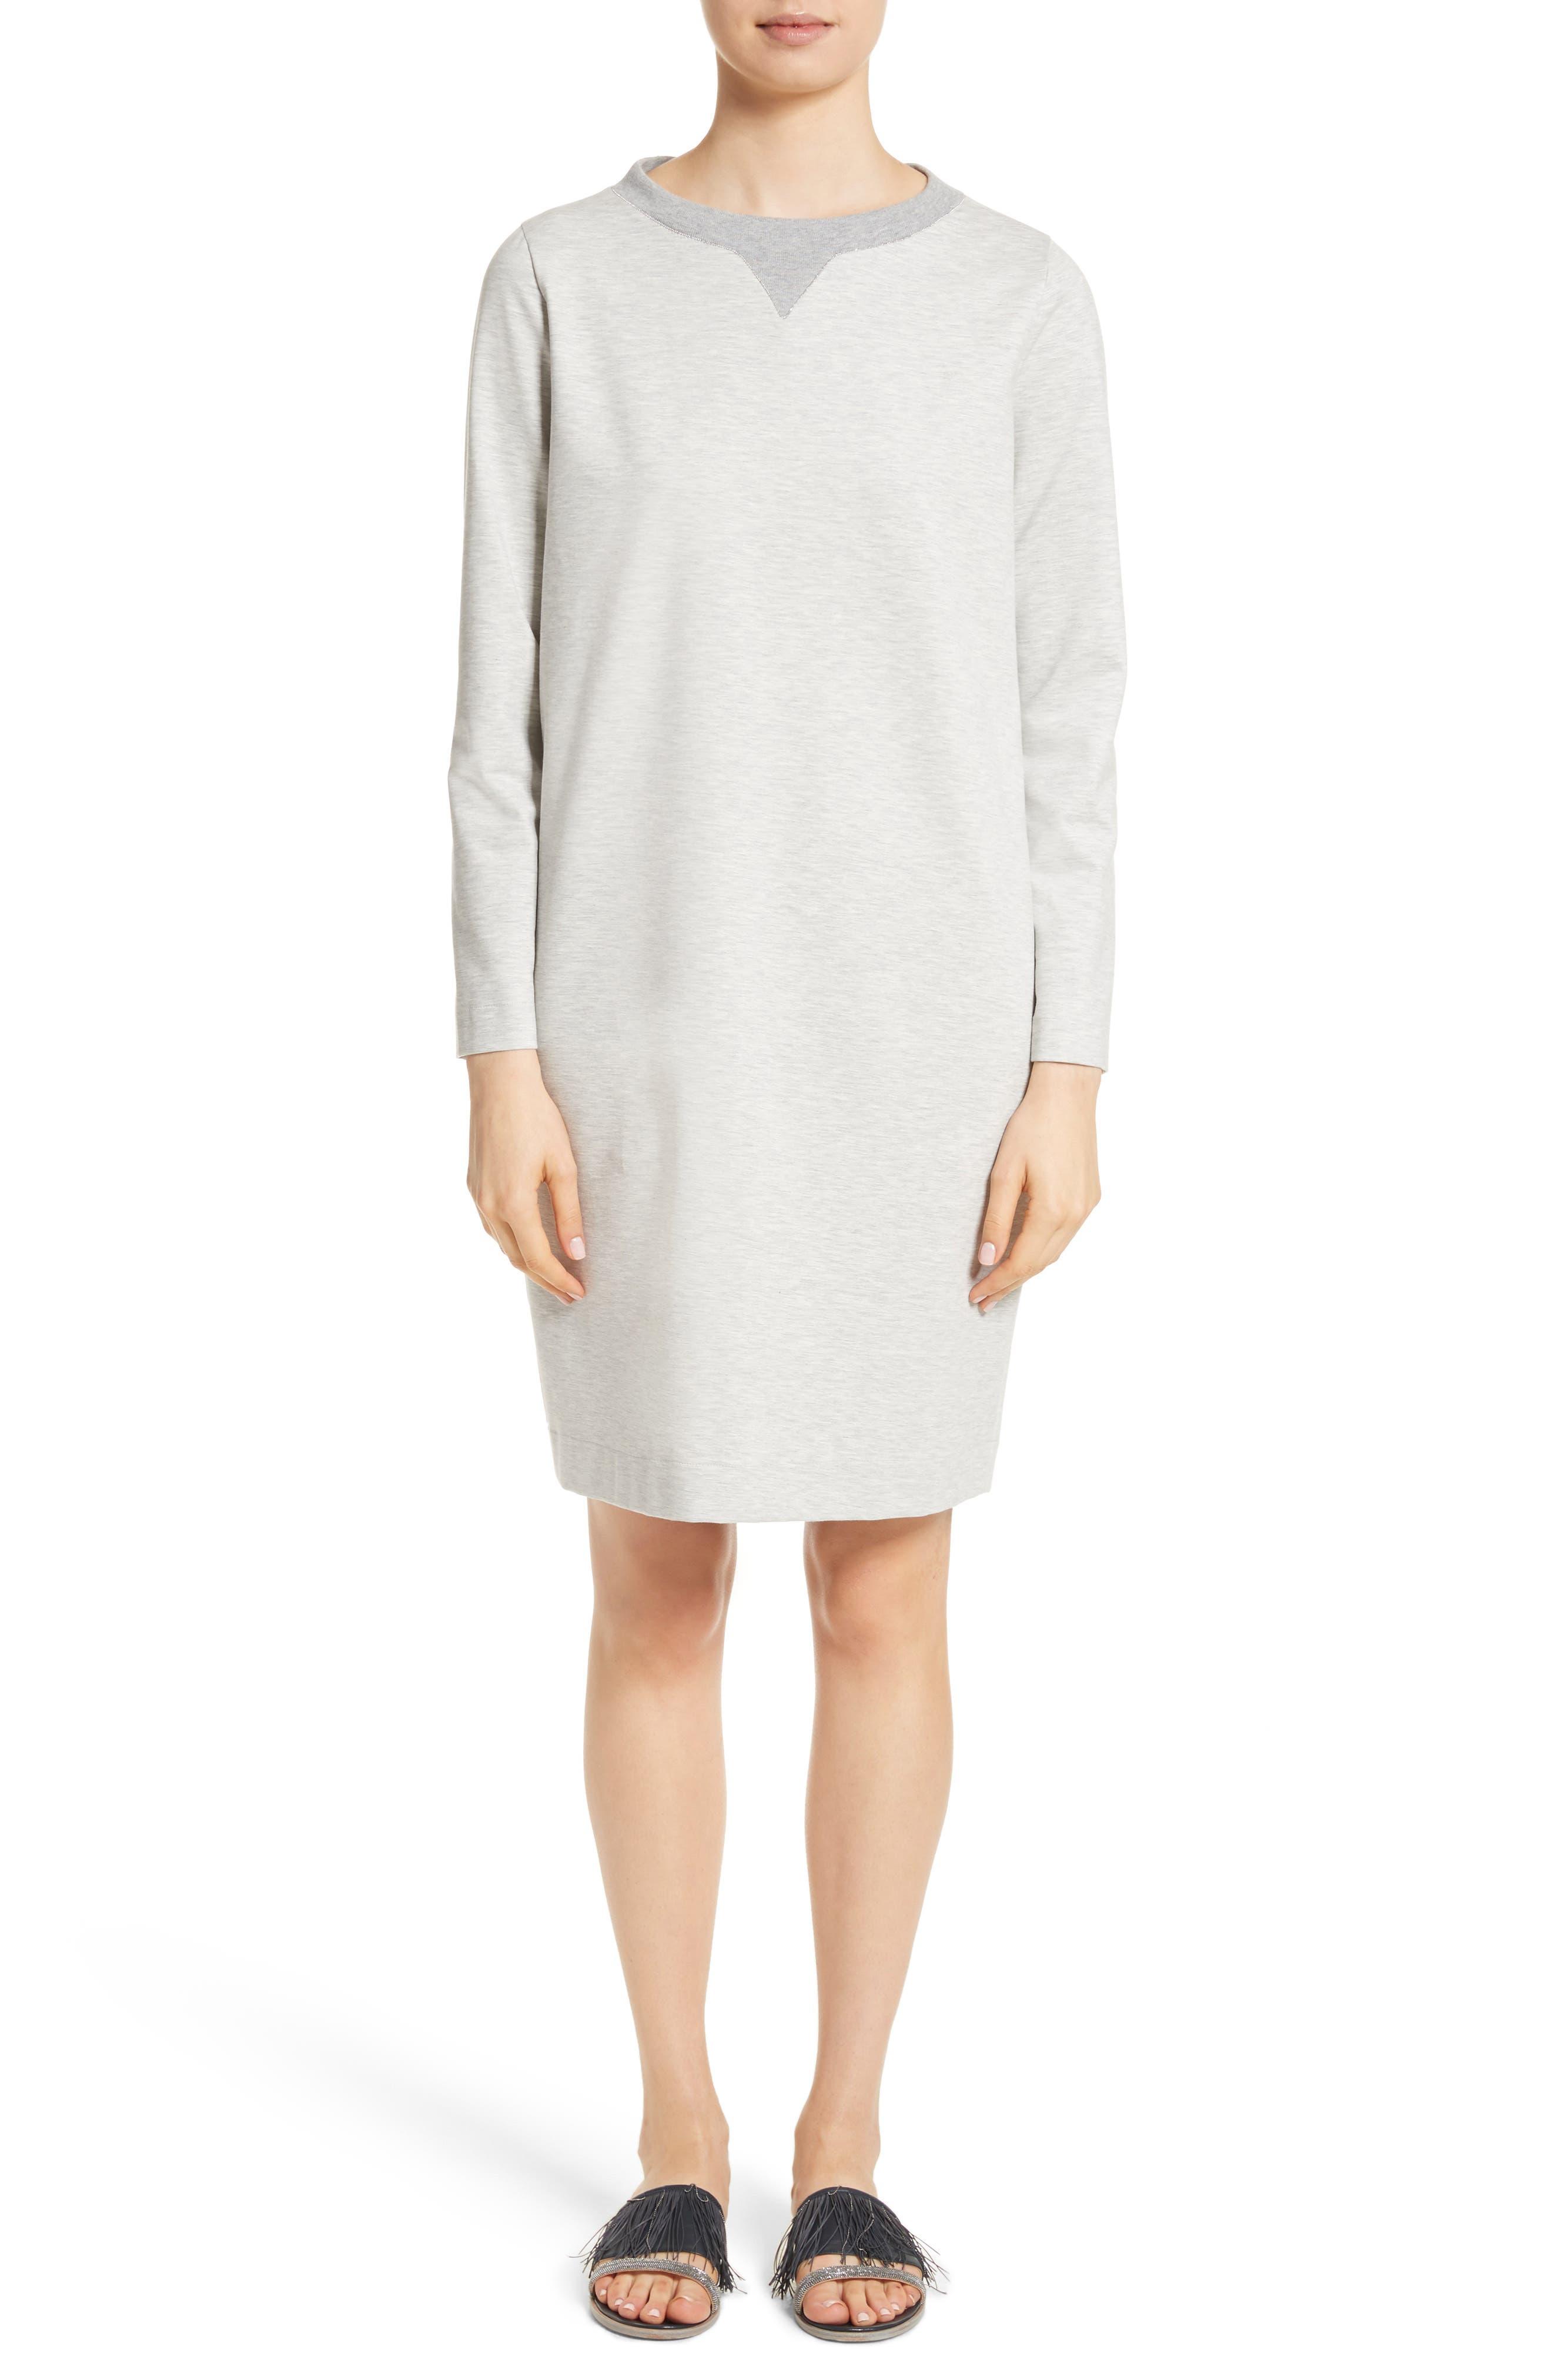 Alternate Image 1 Selected - Fabiana Filippi Rodier Jersey Sweatshirt Dress